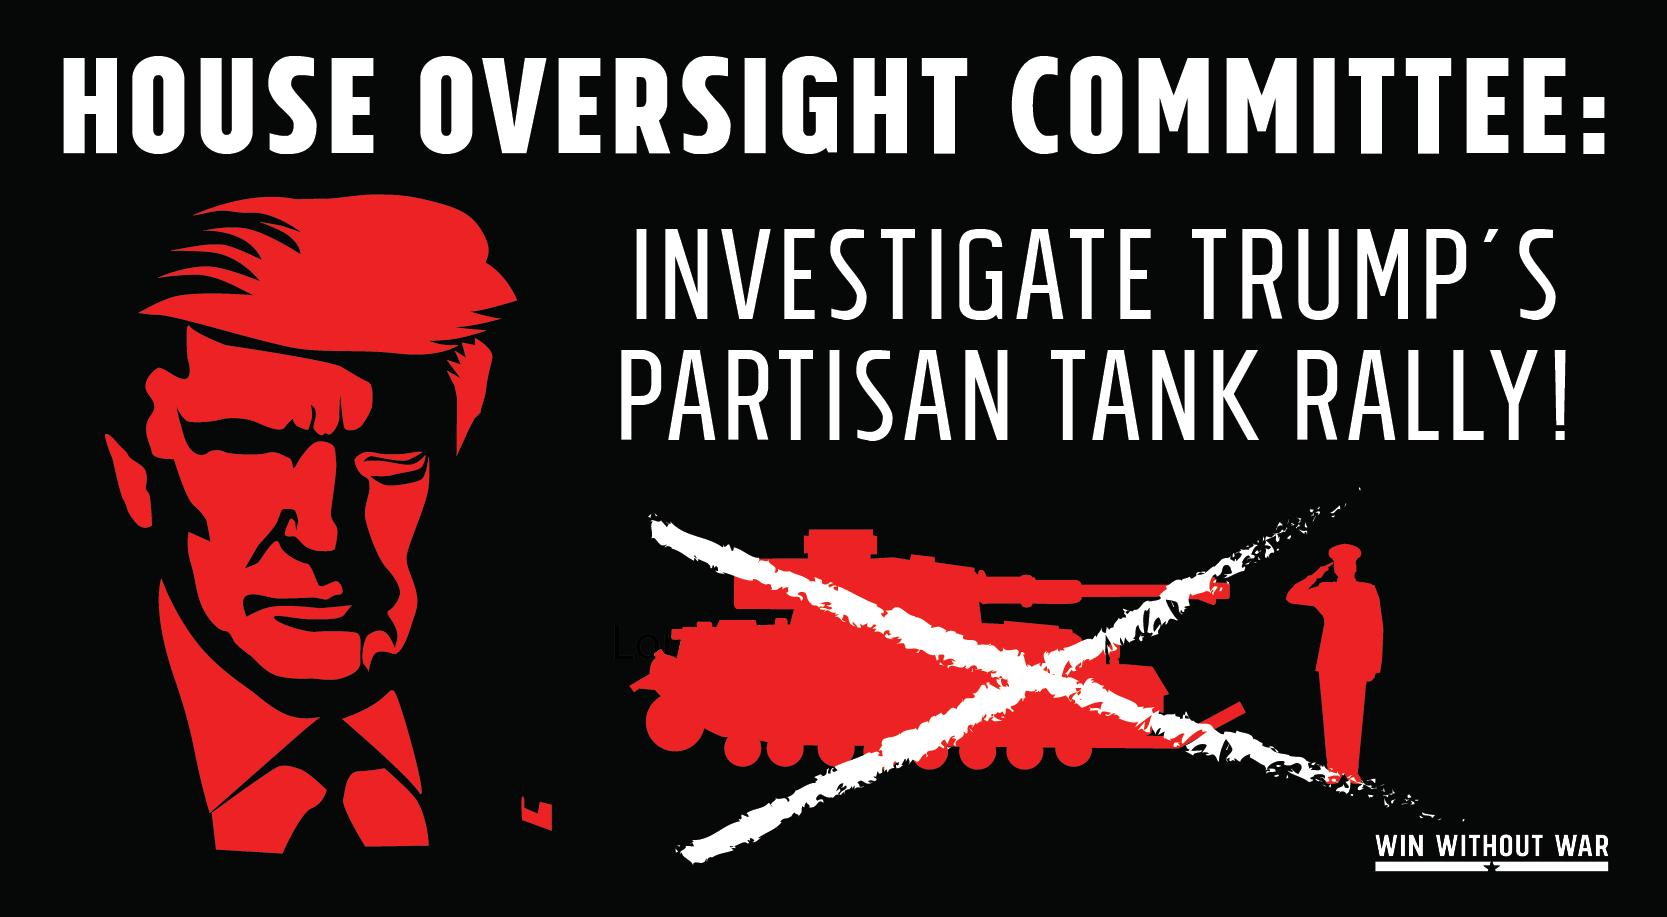 Investigate Trump's partisan tank rally!